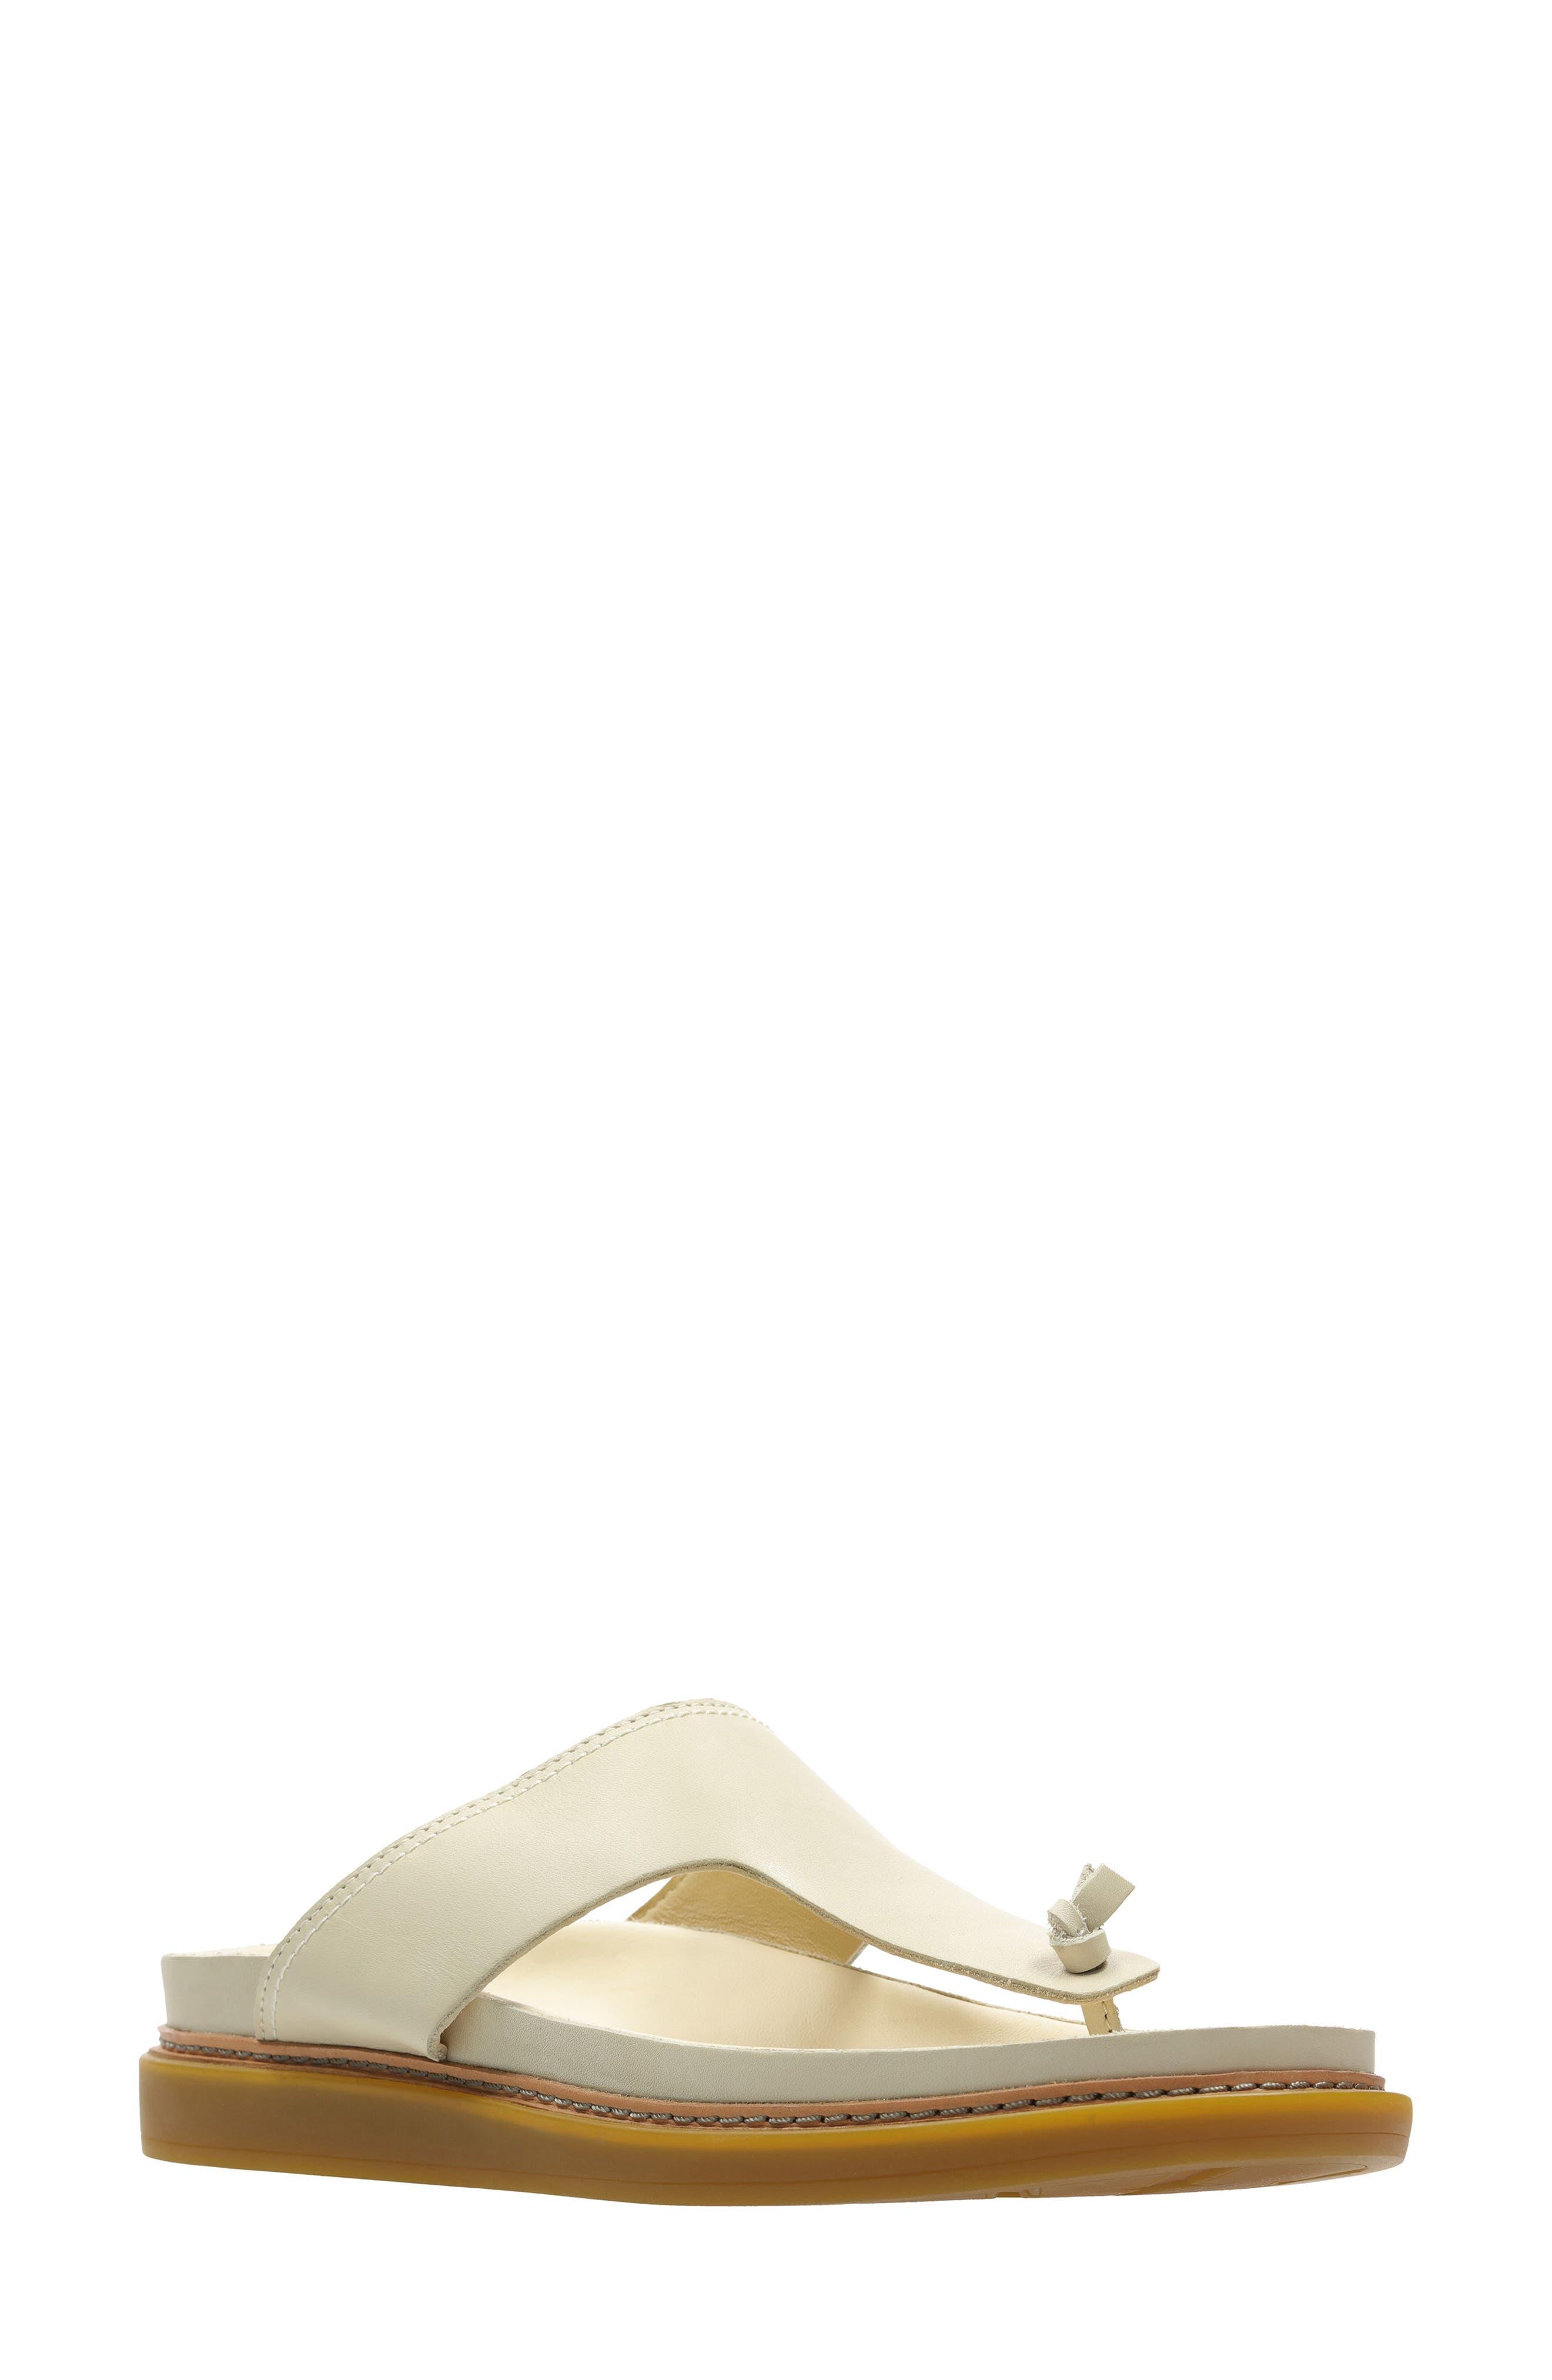 ClarksR Women s Clarks Trace Short T Strap Sandal E5119